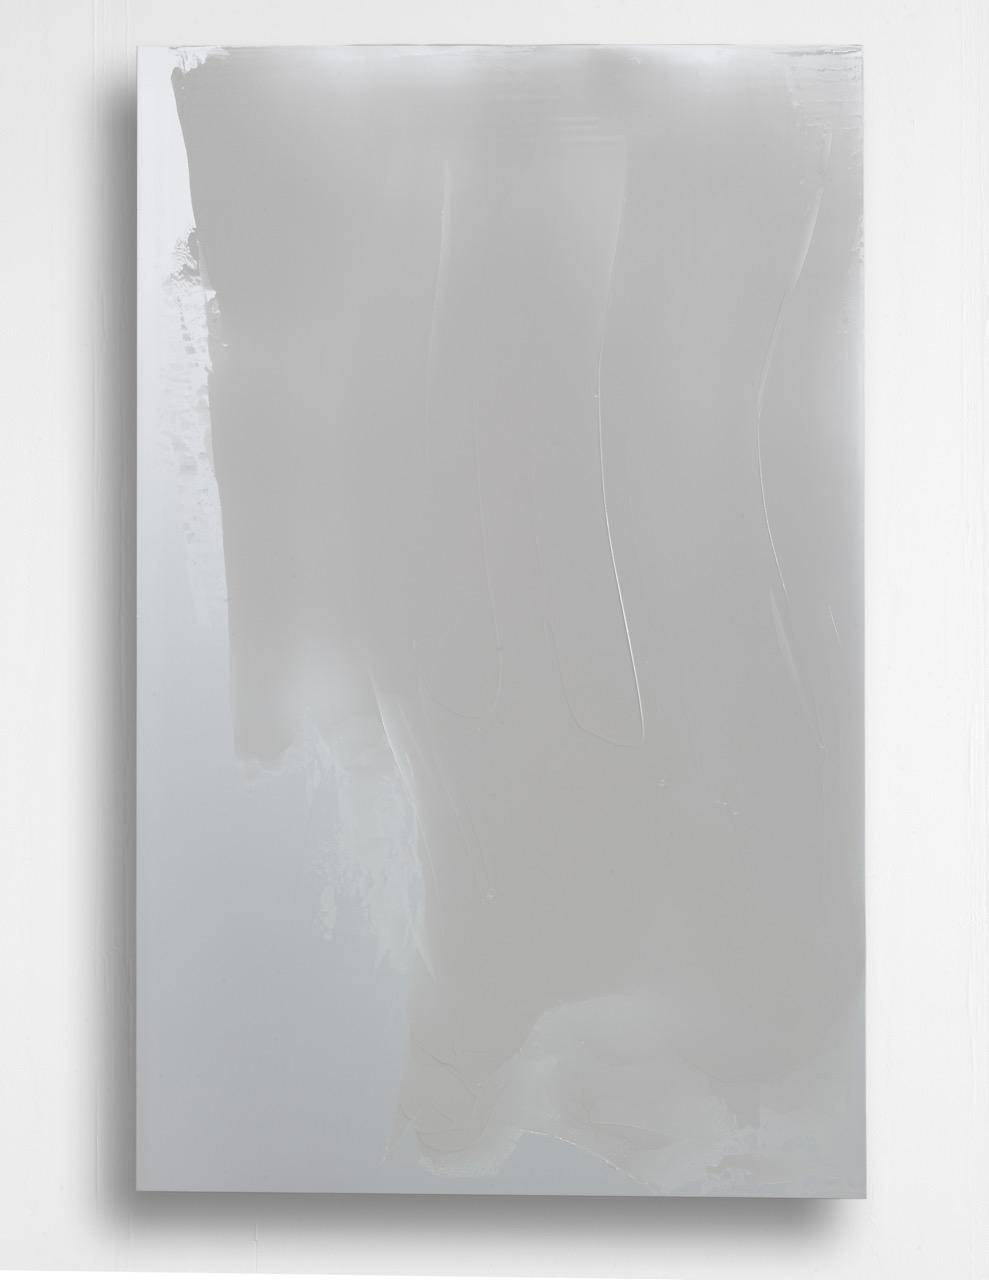 Untitled (Pear Blossoms), 2007, 180x75cm.jpg